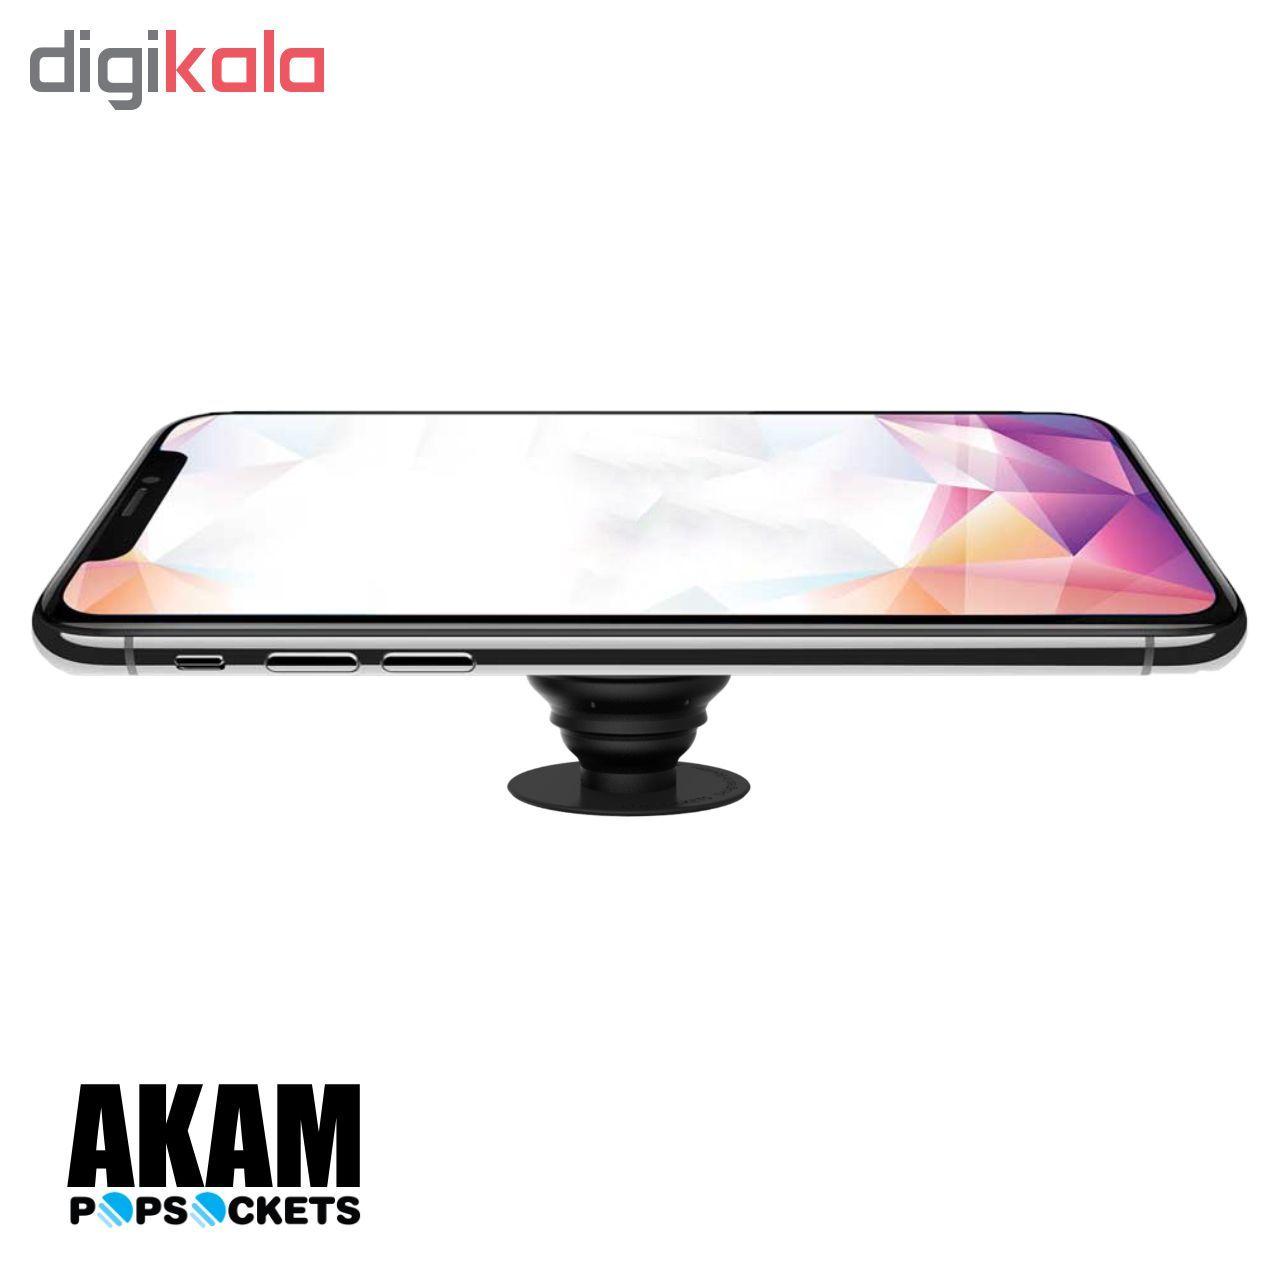 پایه نگهدارنده گوشی موبایل پاپ سوکت آکام مدل APS0161 main 1 9